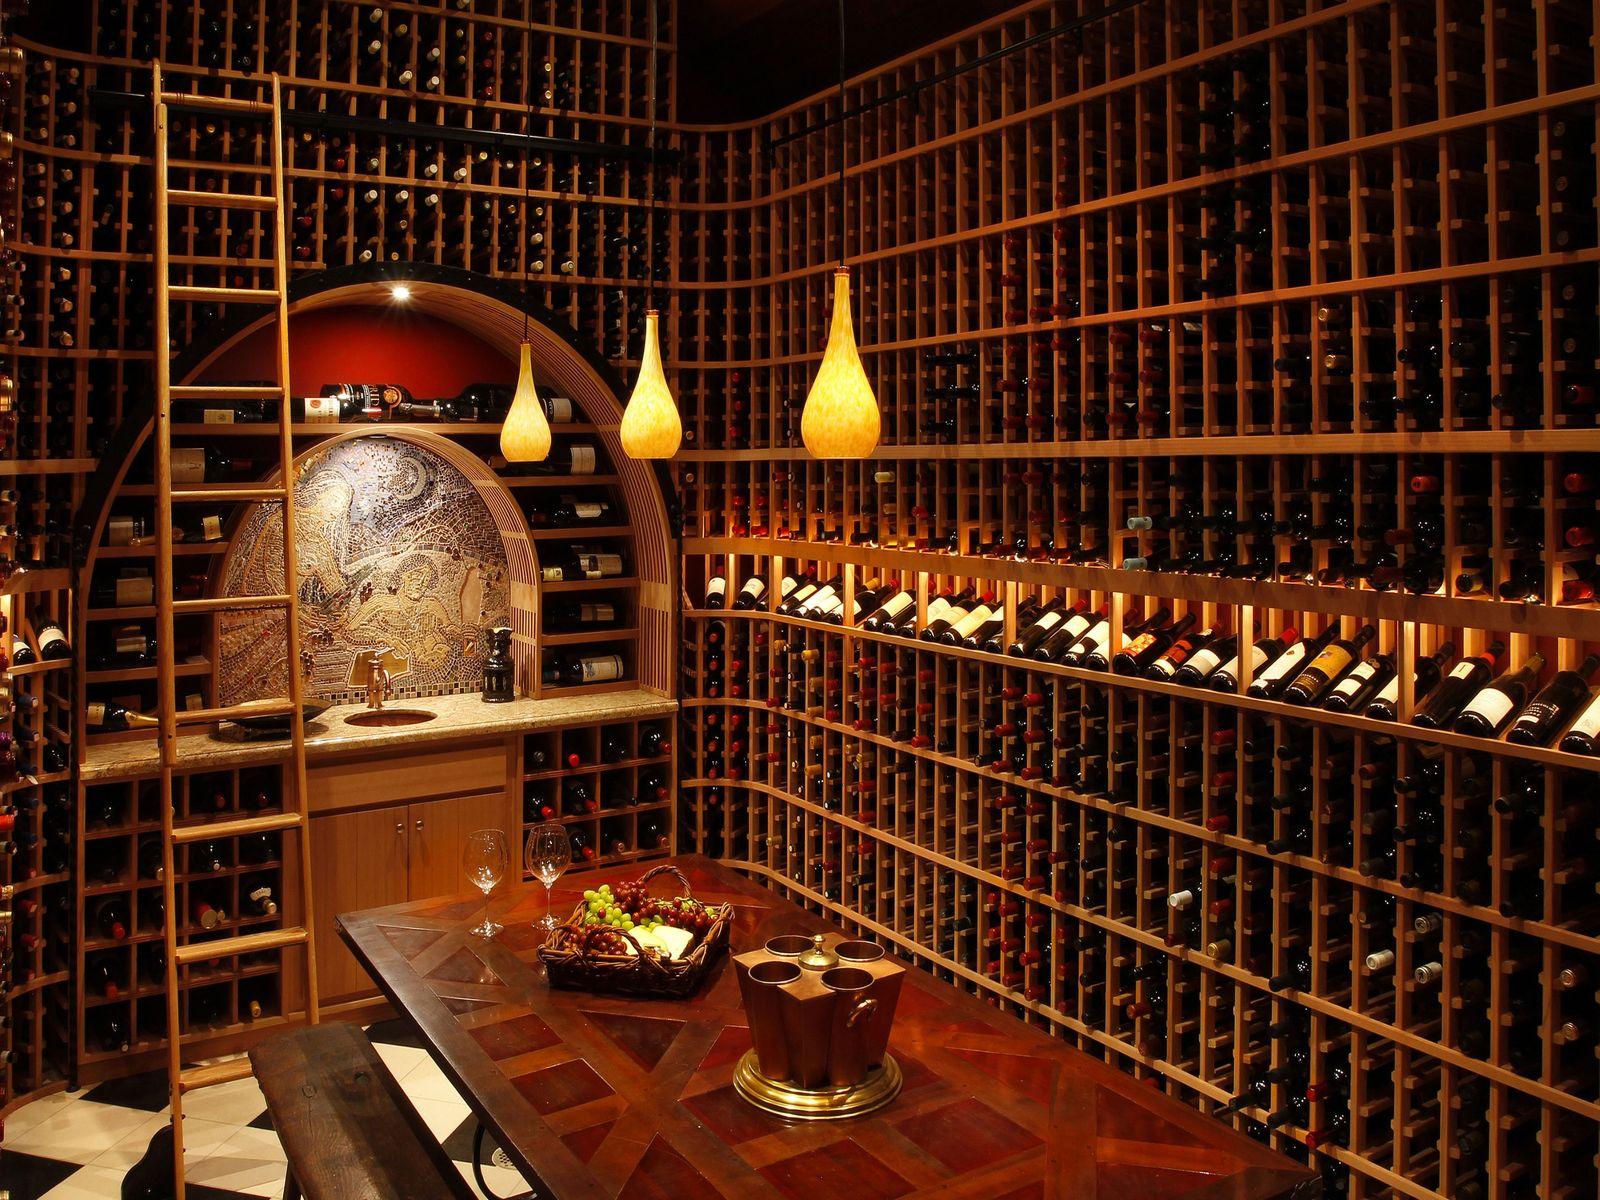 4,500+ bottle temperature controlled wine cellar.